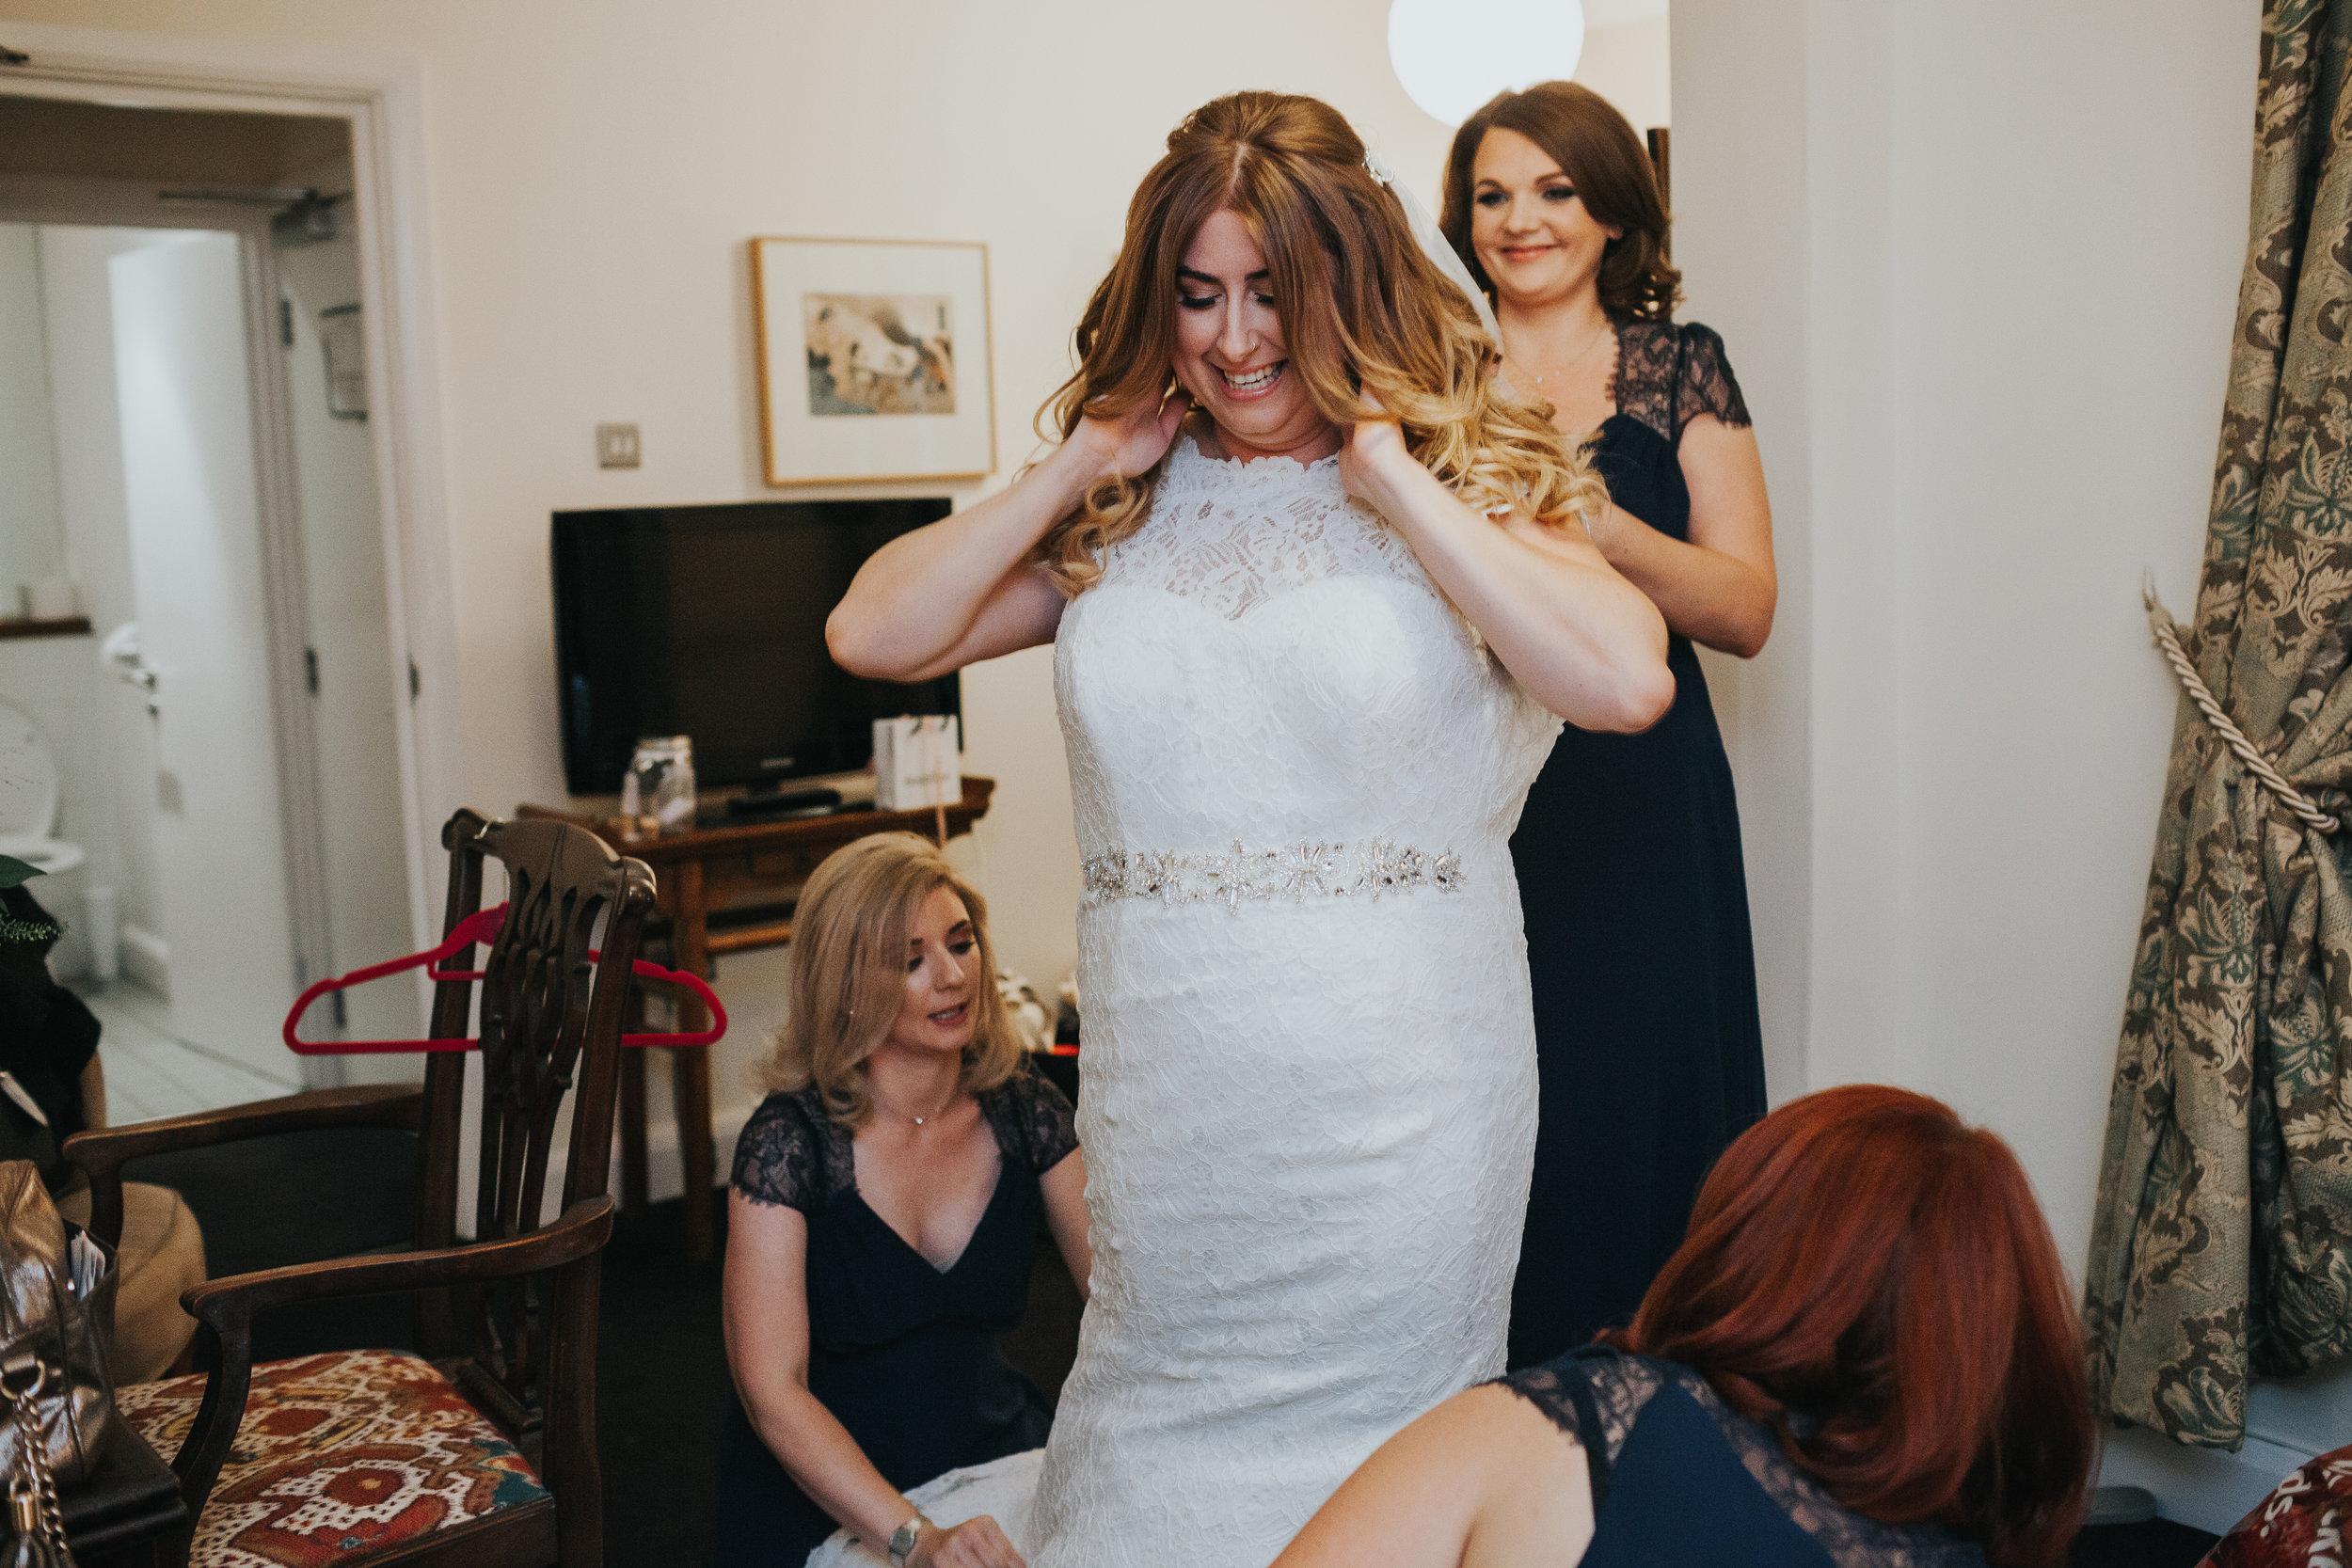 Bride gets into her wedding dress in her hotel room in merseyside.